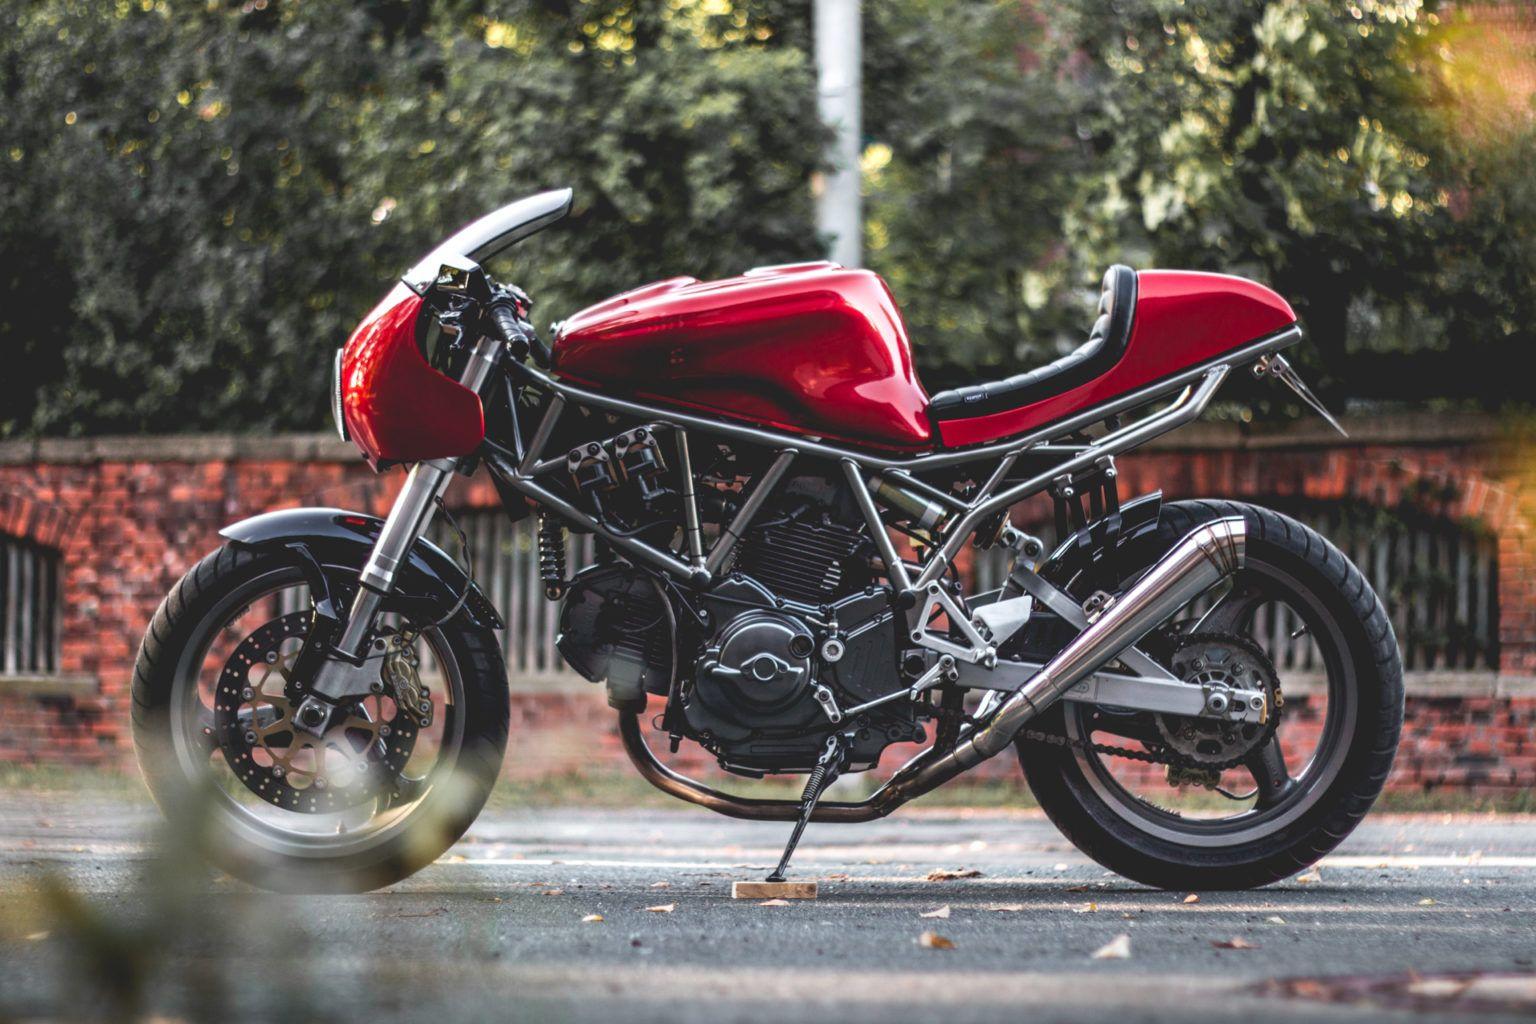 Ducati 750ss By Kaspeed Moto Ducati 750ss Ducati 750 Ducati